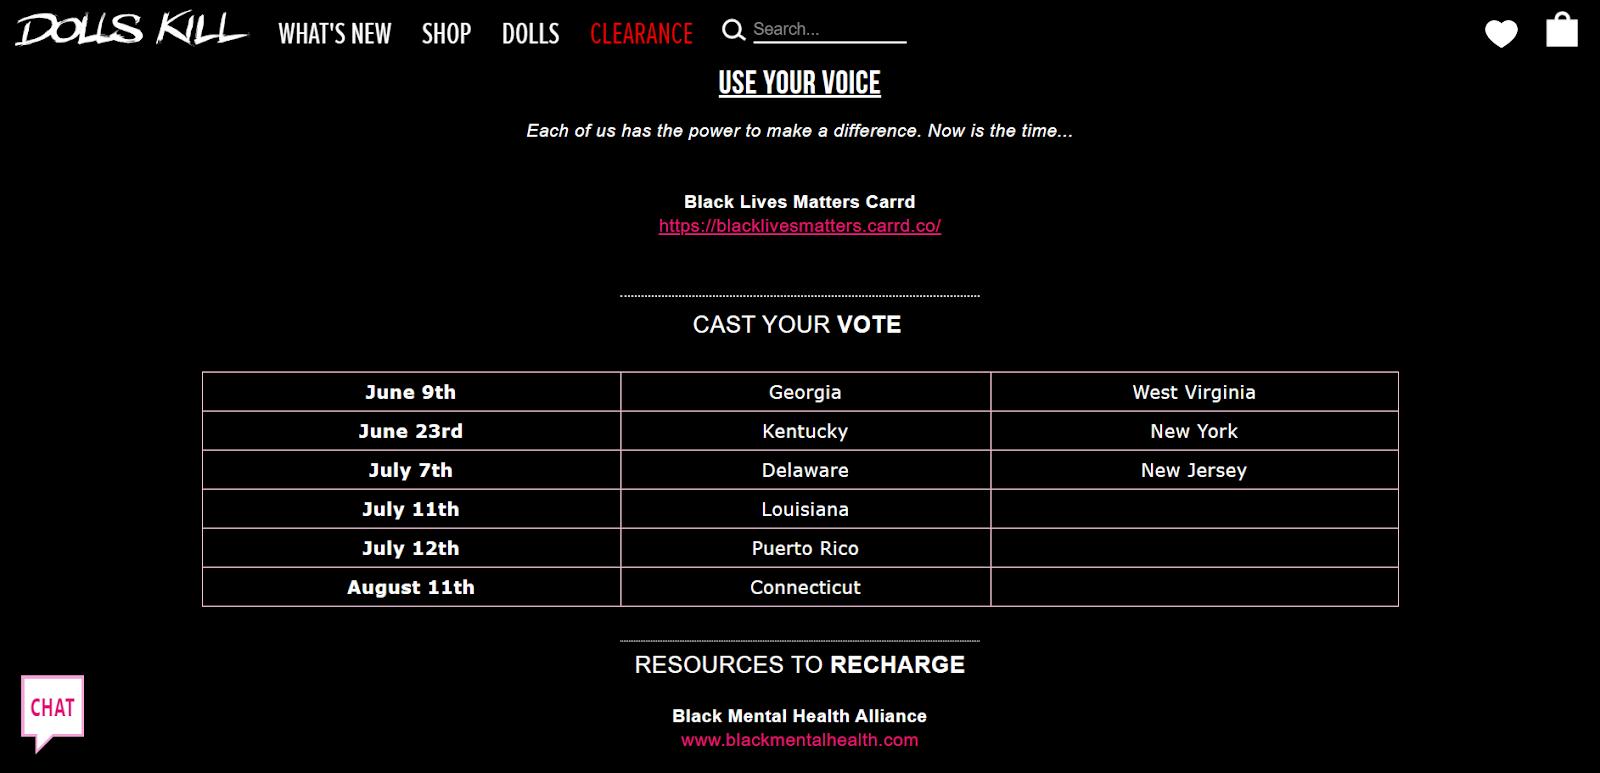 Dolls Kill Black Lives Matter web page screenshot